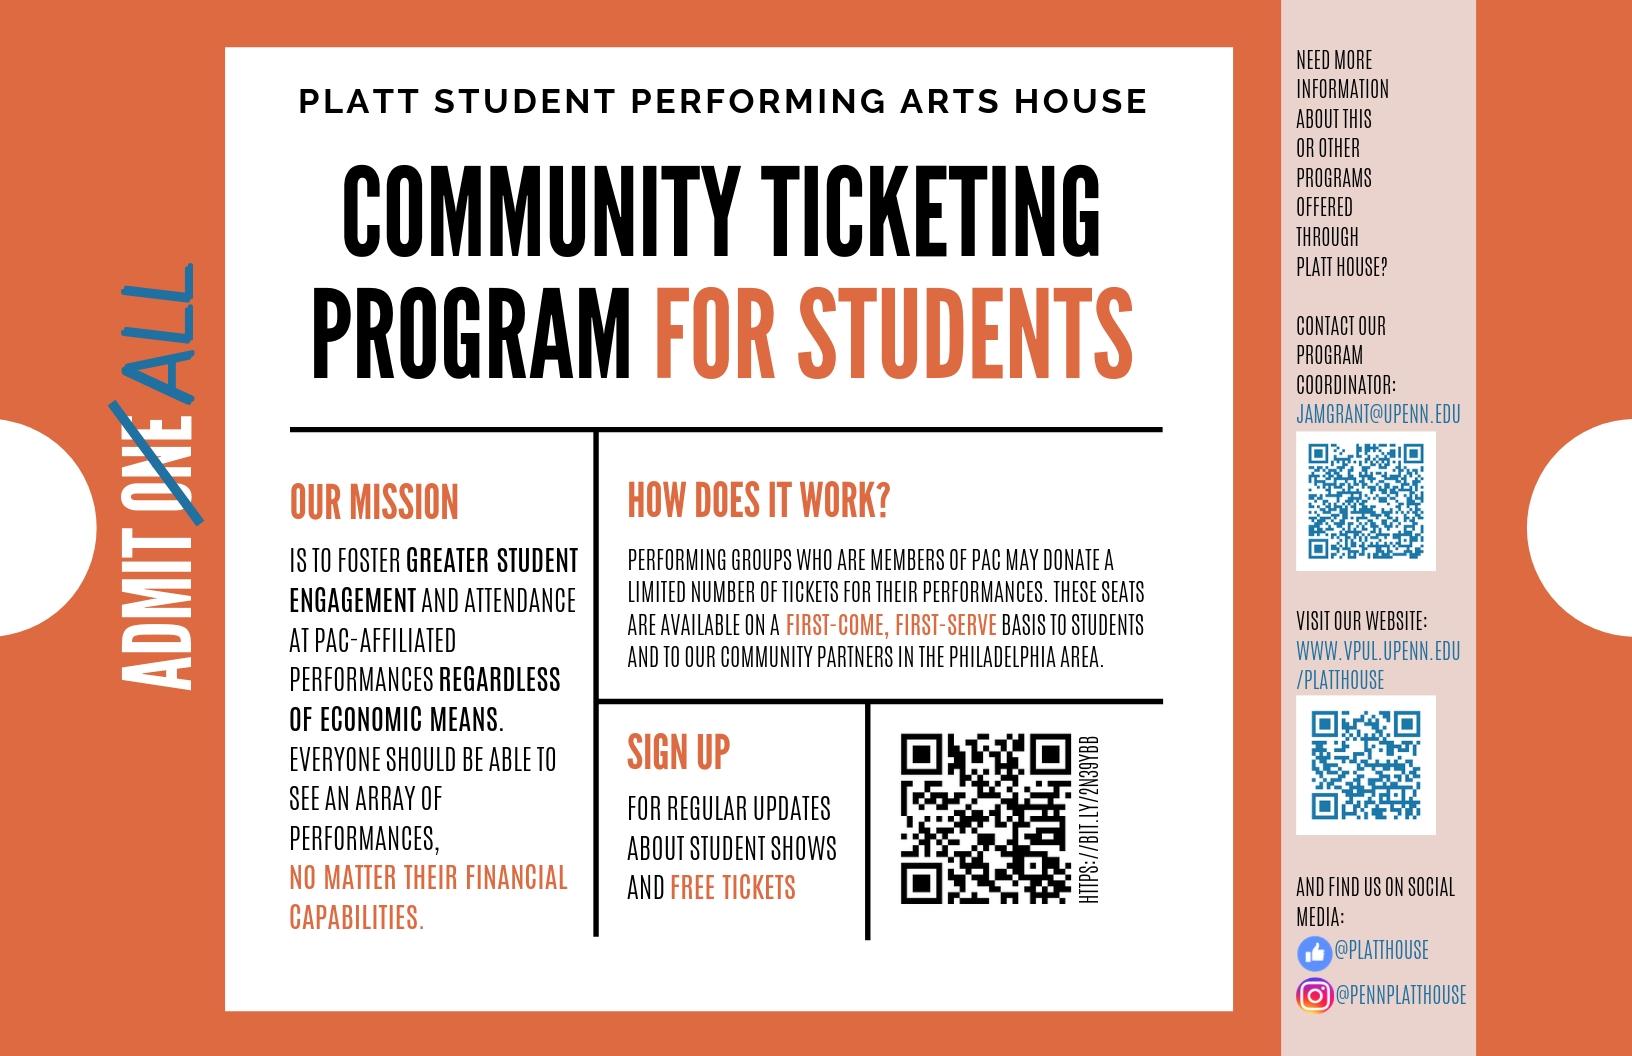 Platt Student Performing Arts House - Home | University Of